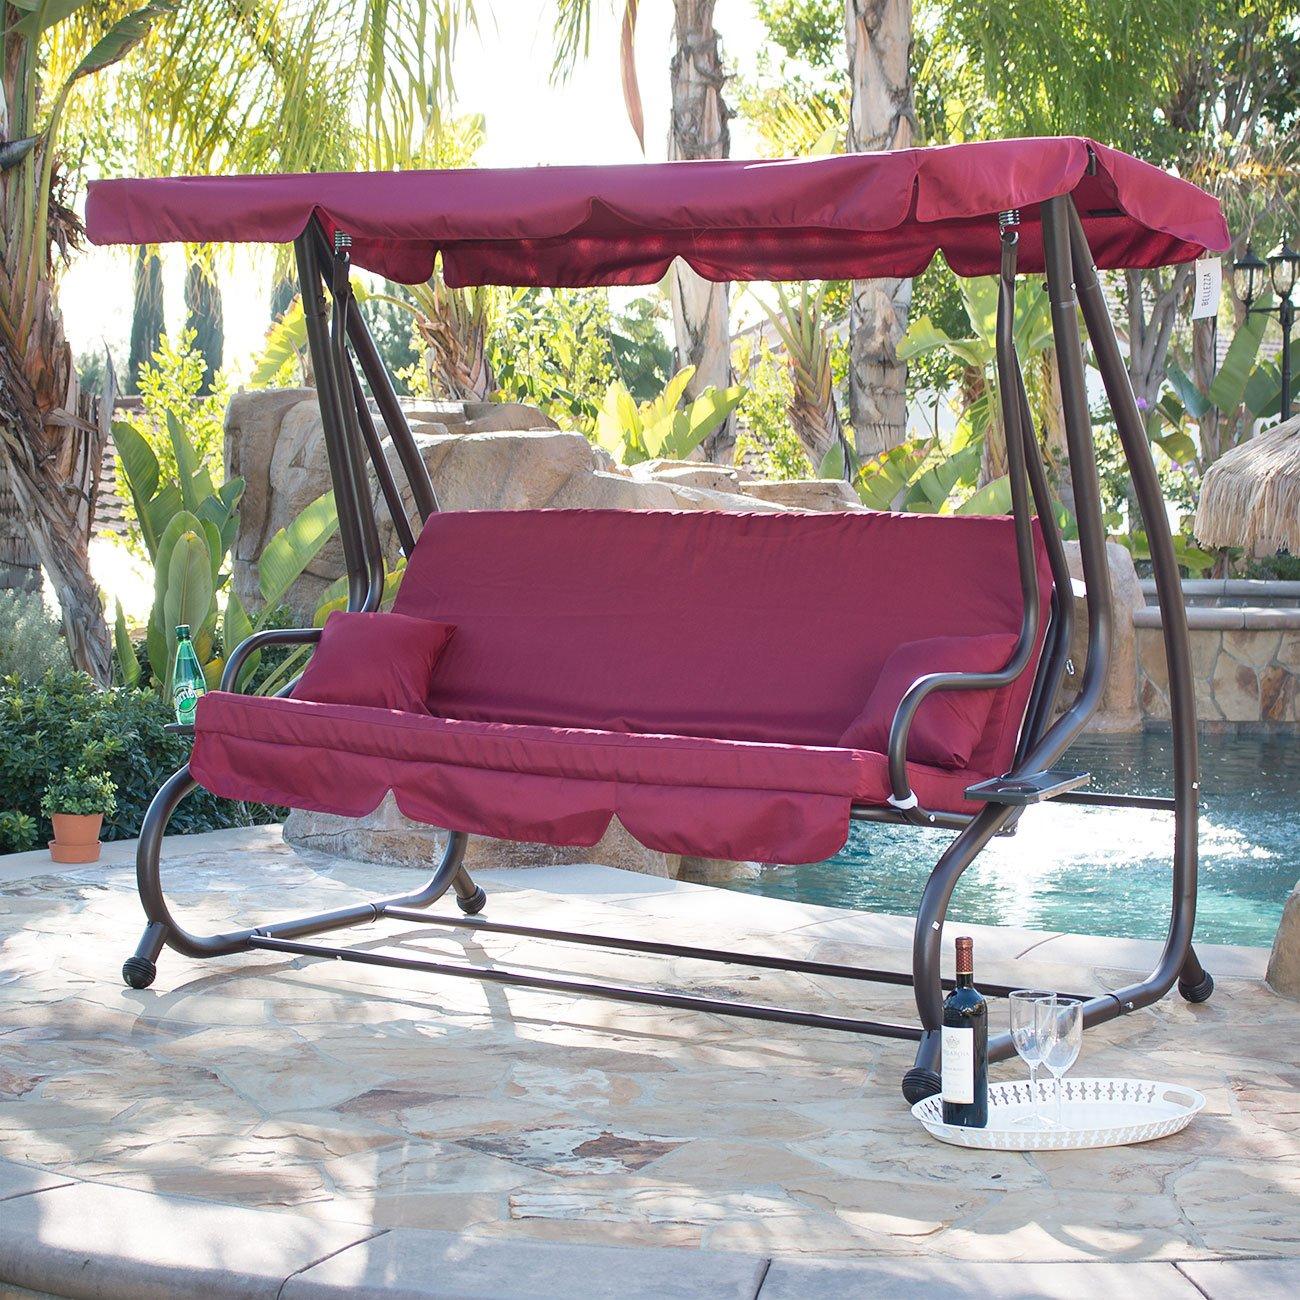 Outdoor hammock bed with cover - Amazon Com Belleze Outdoor Canopy Porch Swing Bed Hammock Tilt Canopy With Steel Frame Burgundy Garden Outdoor